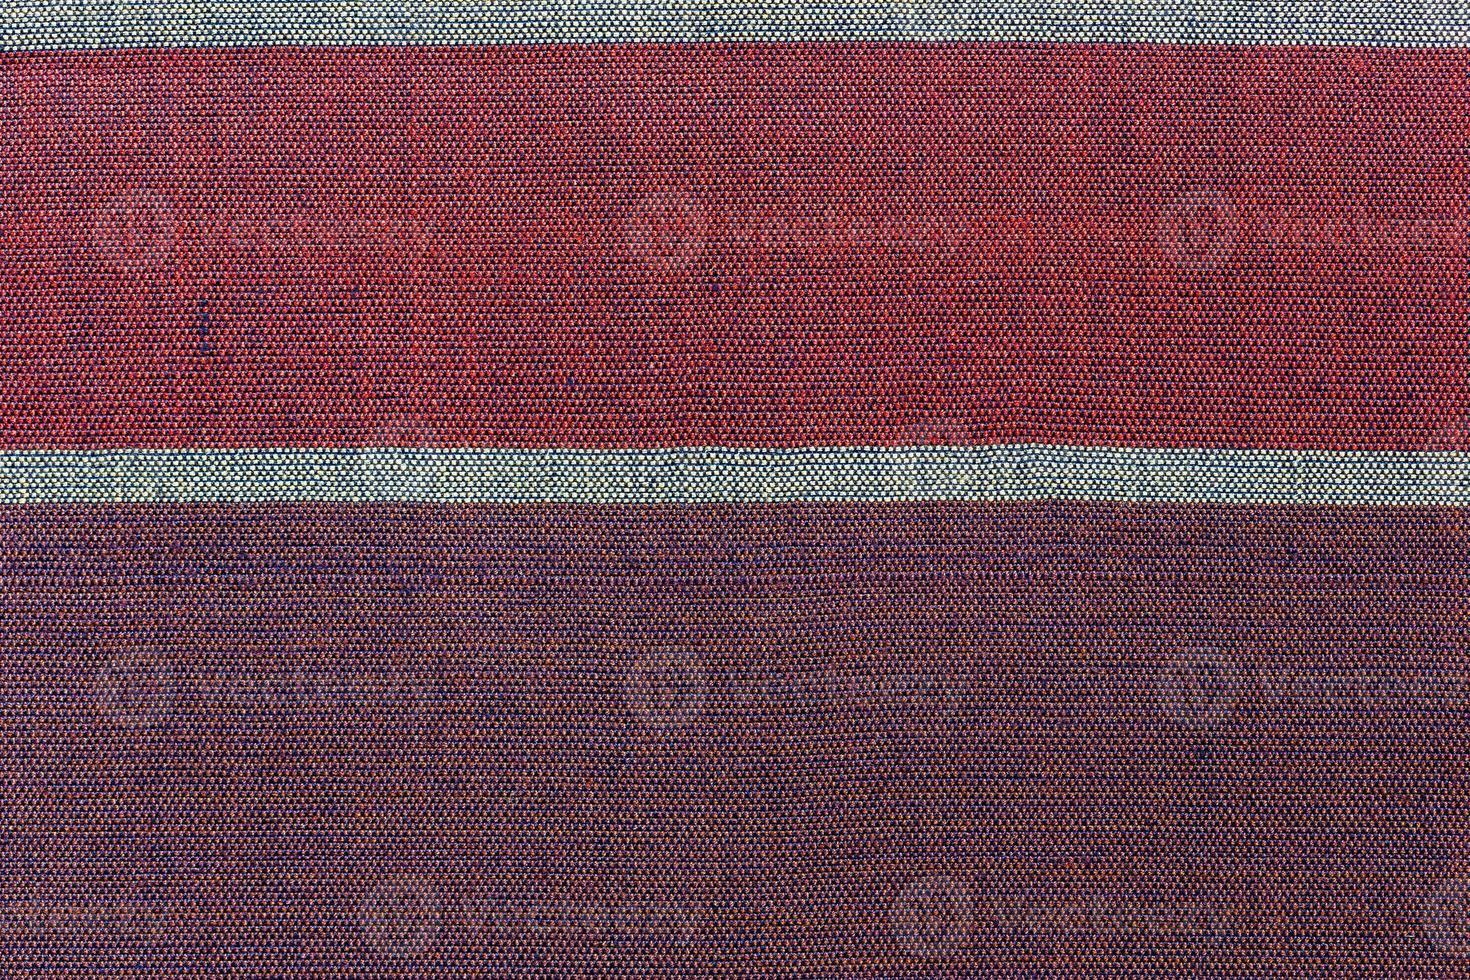 Thais zijdestofpatroon foto